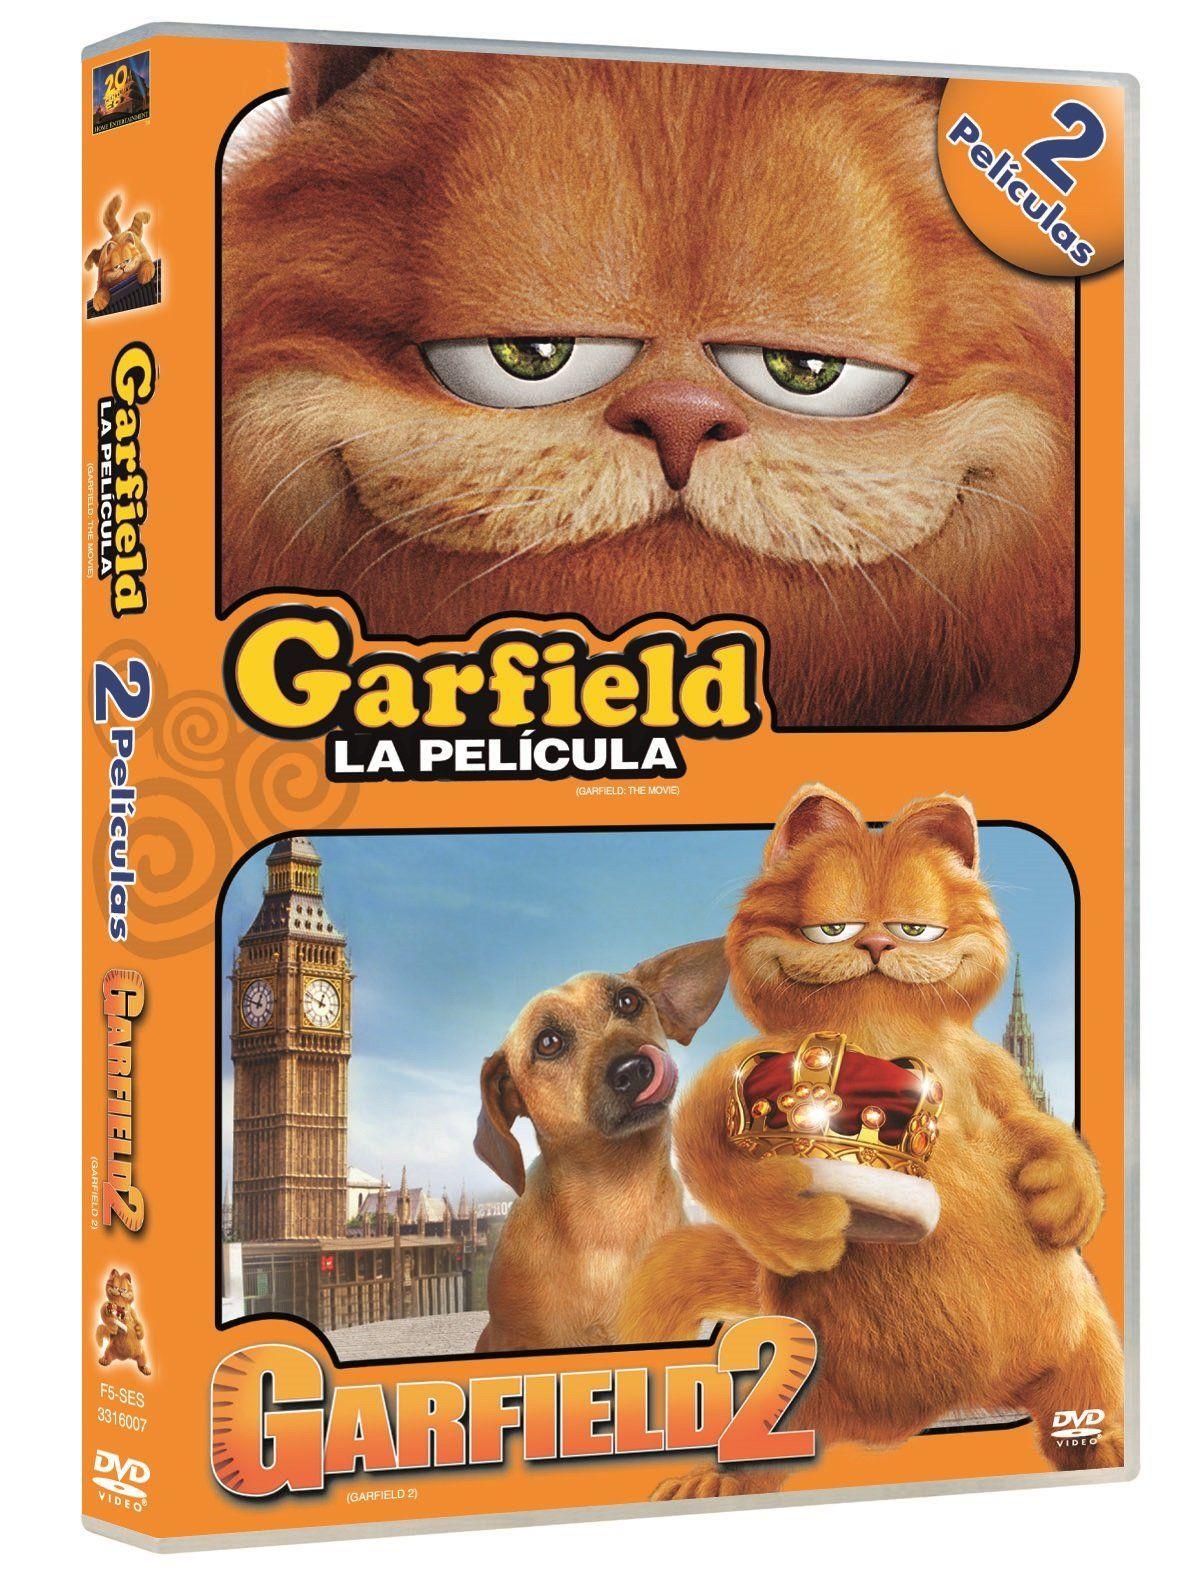 Pack Garfield 1 Garfield 2 Dvd Pack Garfield Dvd Garfield Childhood Movies Dvd